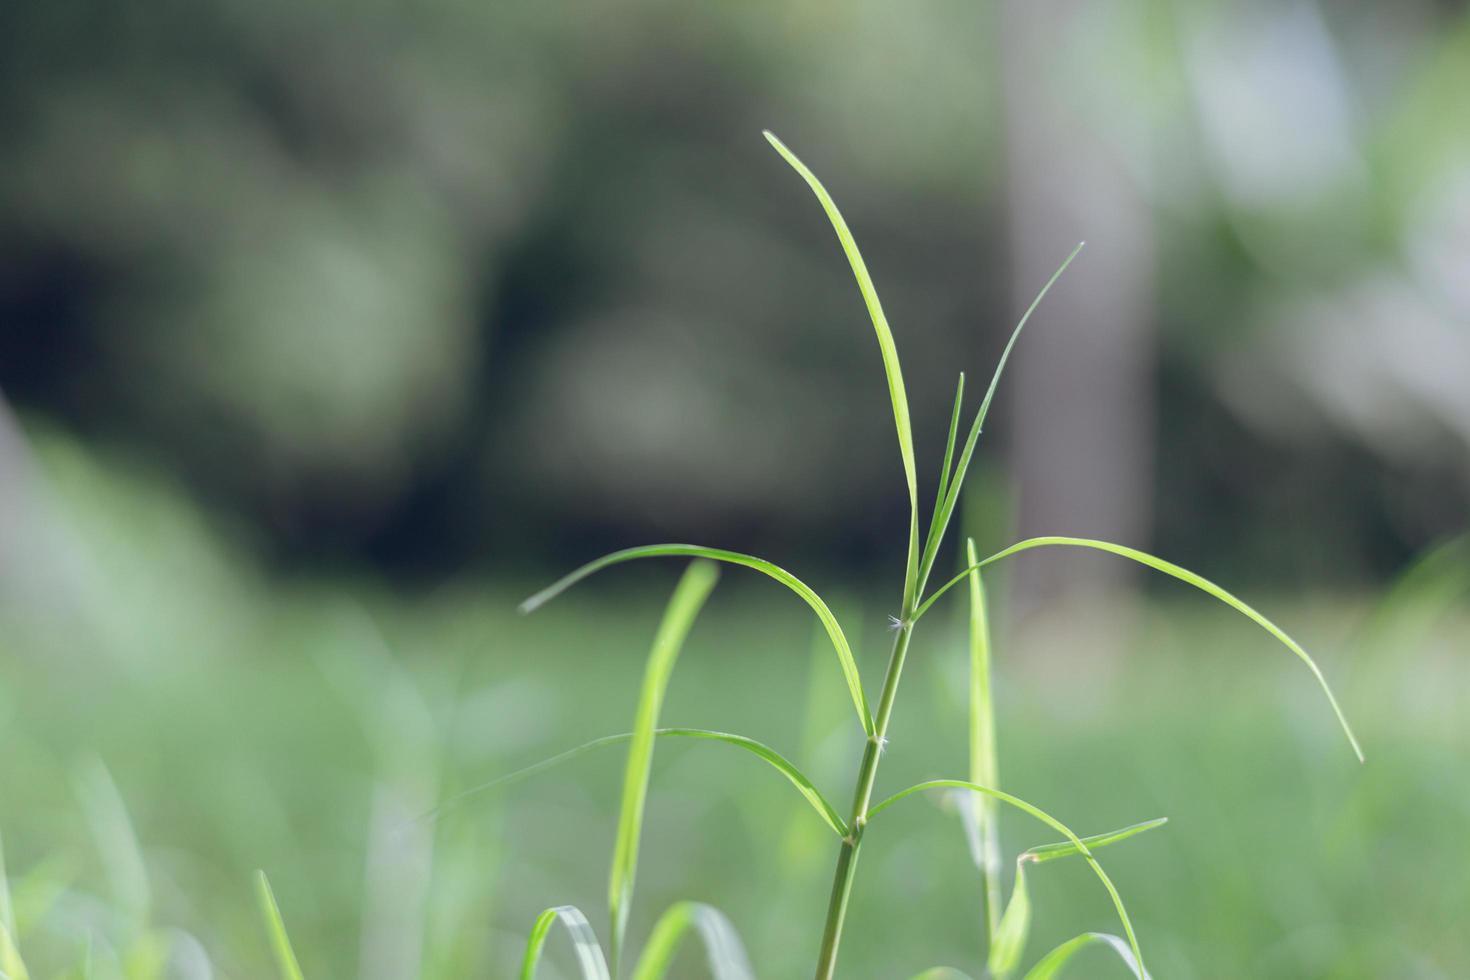 opkomend jong gras met frisse groene achtergrond foto